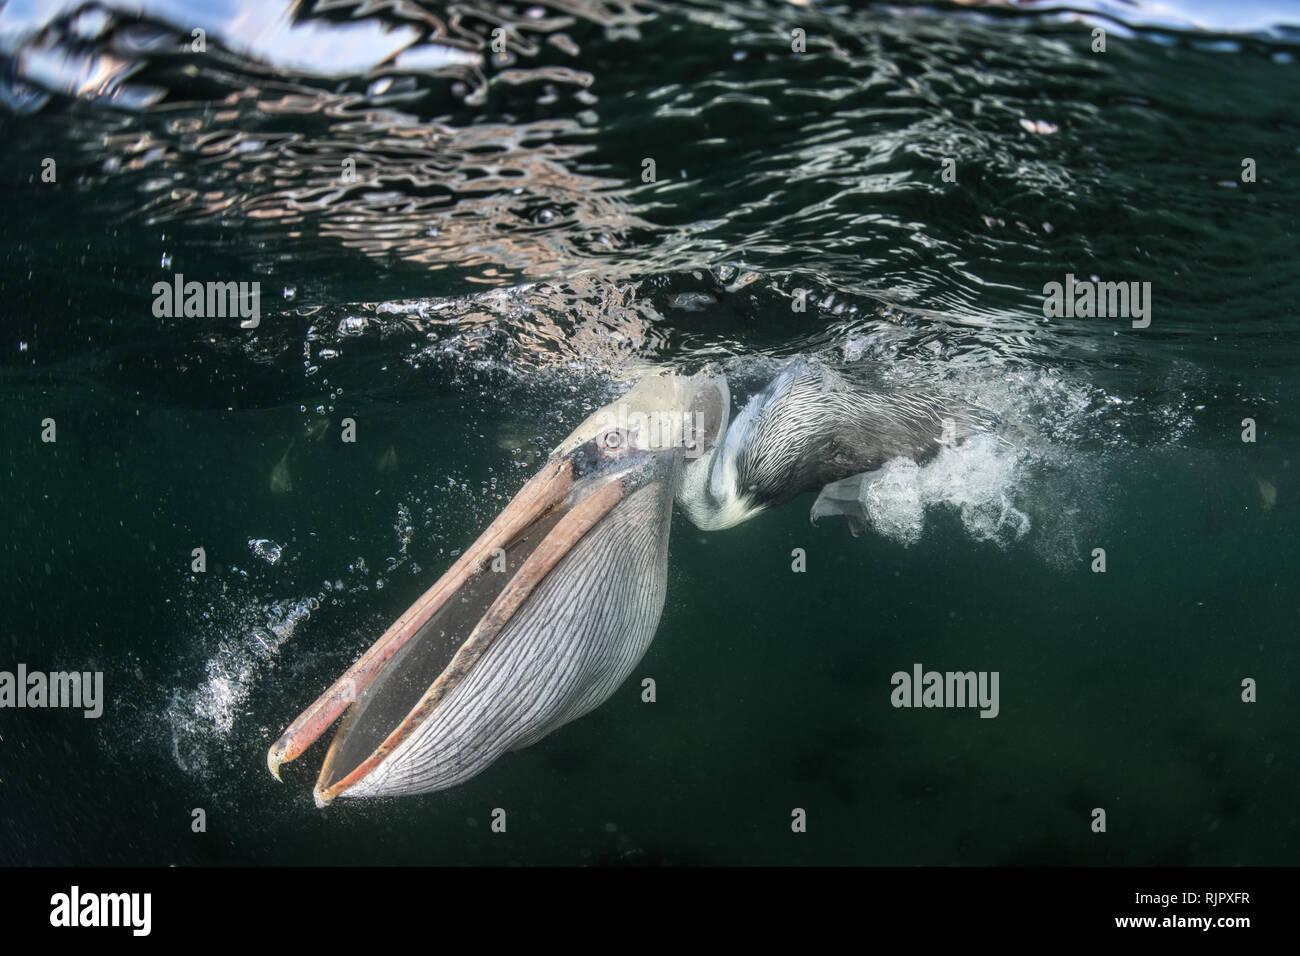 Flocks of brown pelicans feeding on fisherman's scraps - Stock Image